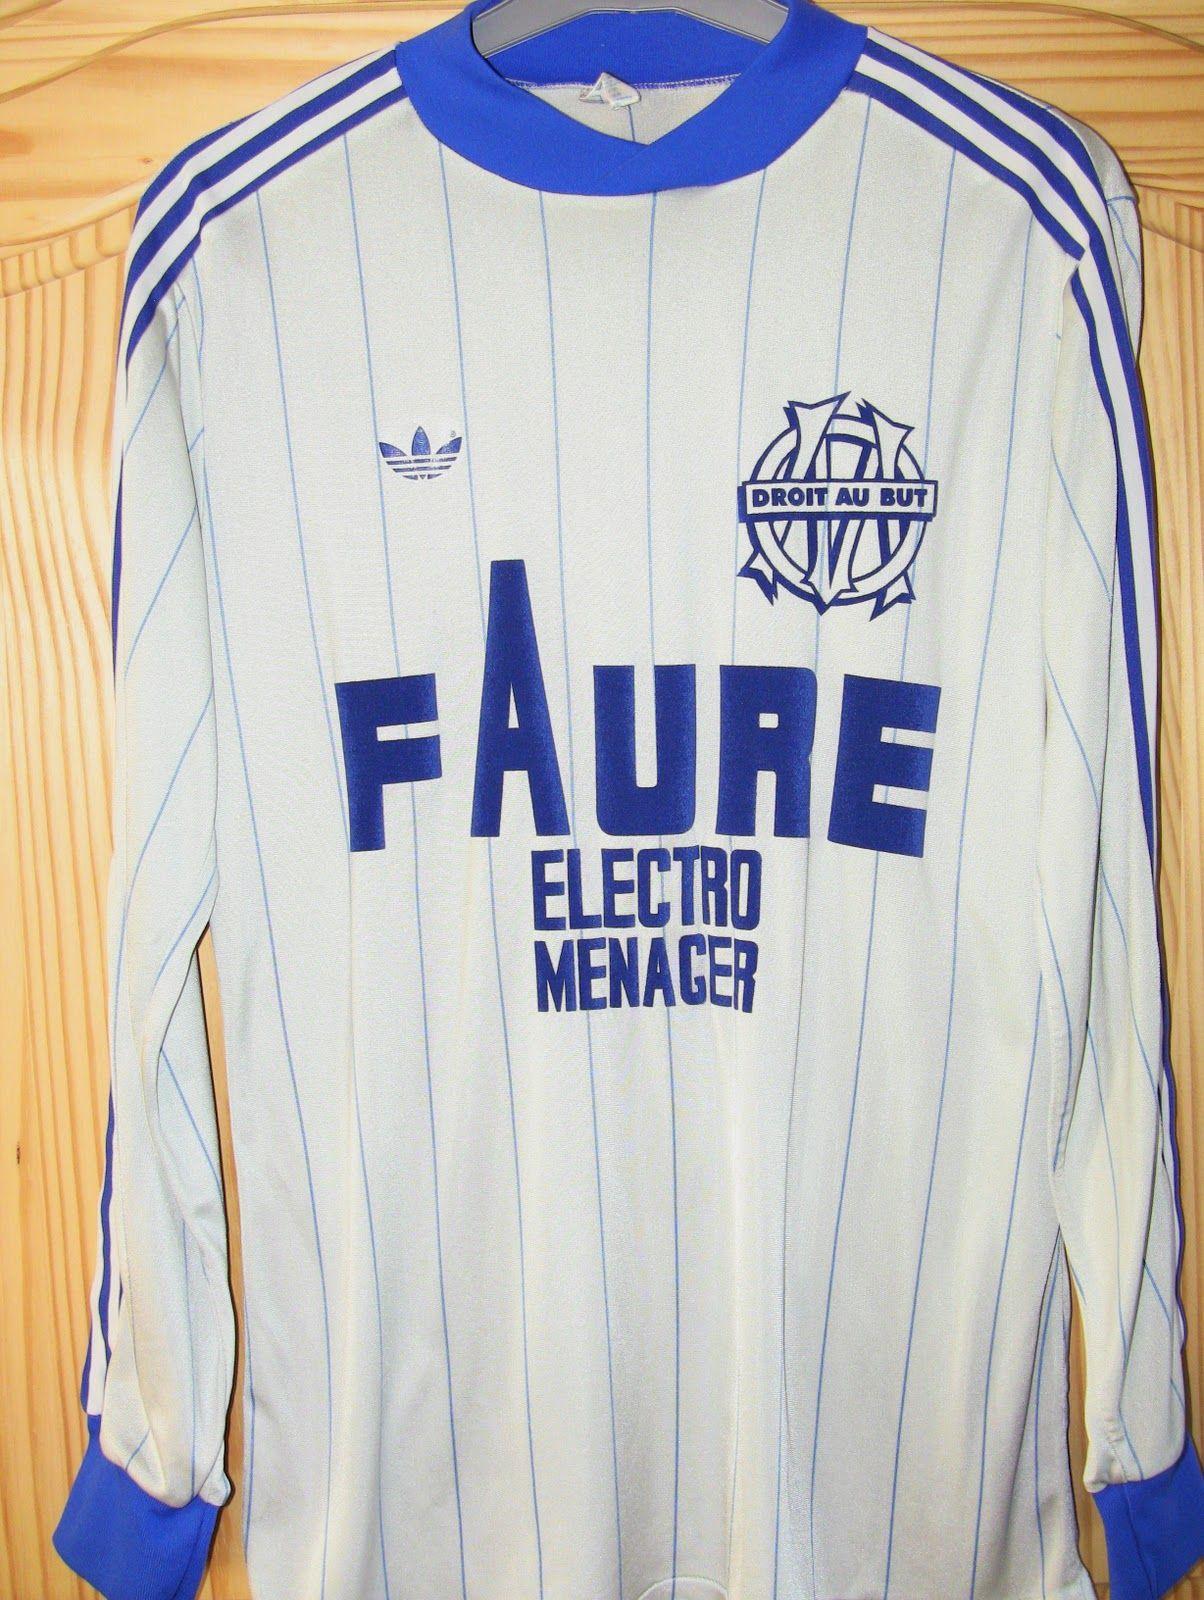 Olympique MarseilleHome Olympique 1981 1981 MarseilleHome 1982adidasomvintage De 1982adidasomvintage De CoedxB